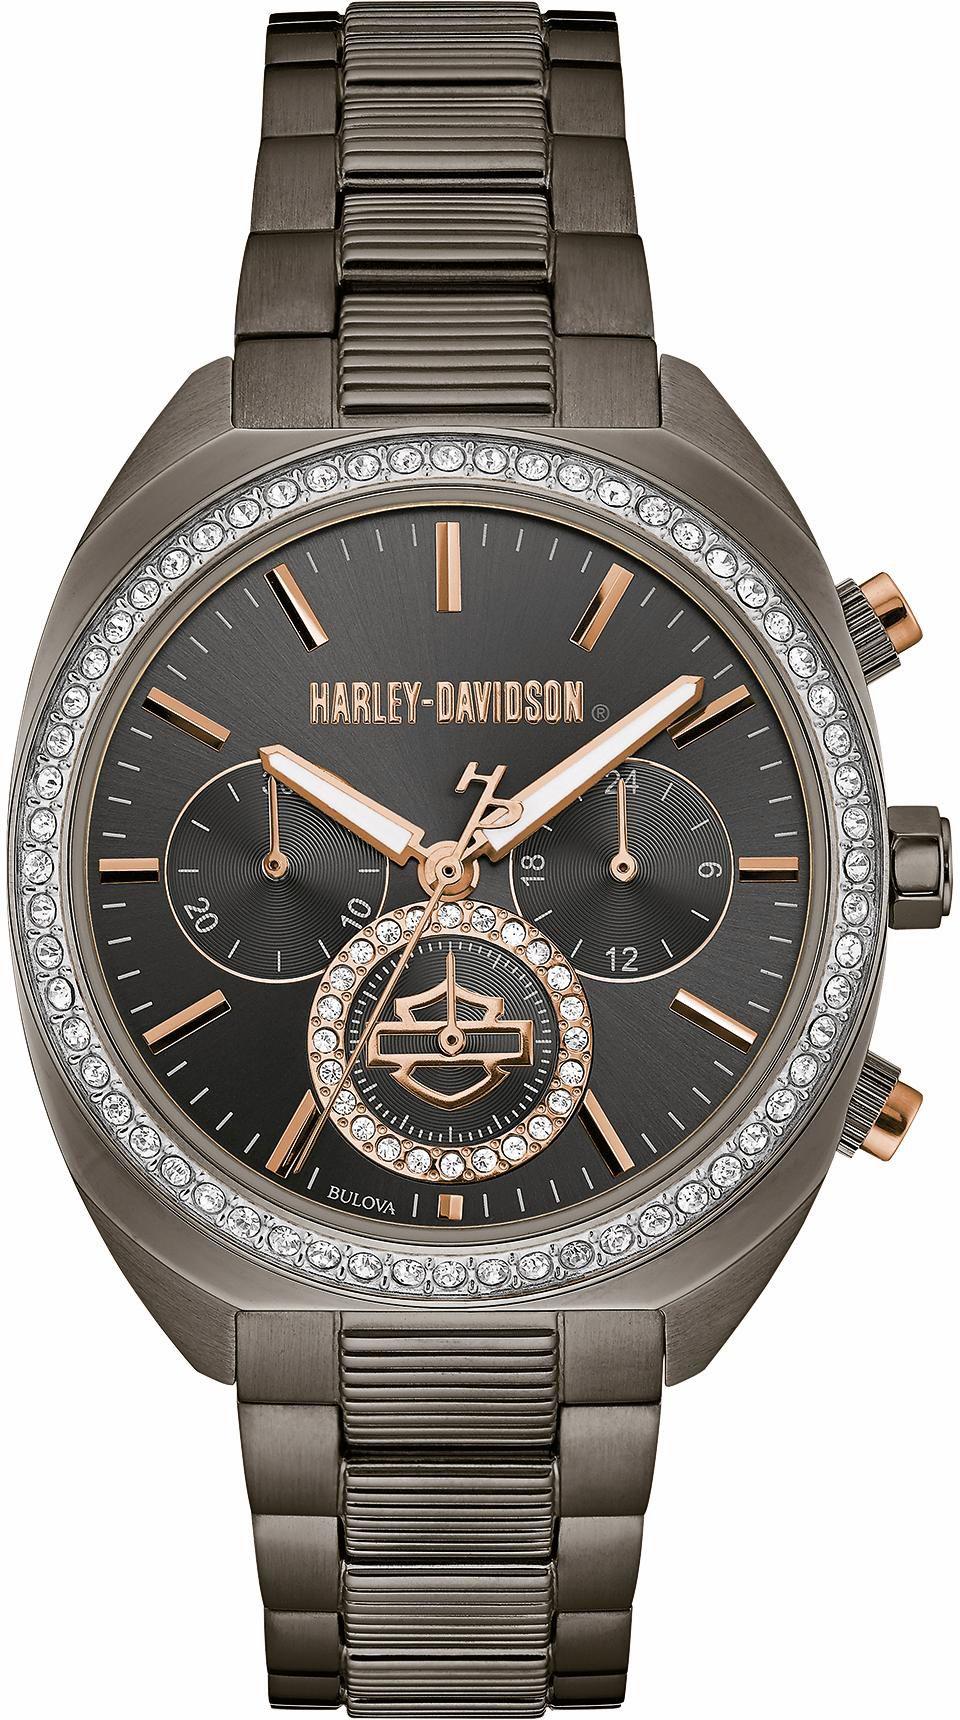 HARLEY DAVIDSON Harley Davidson Chronograph »Lady Gear, 78M103«